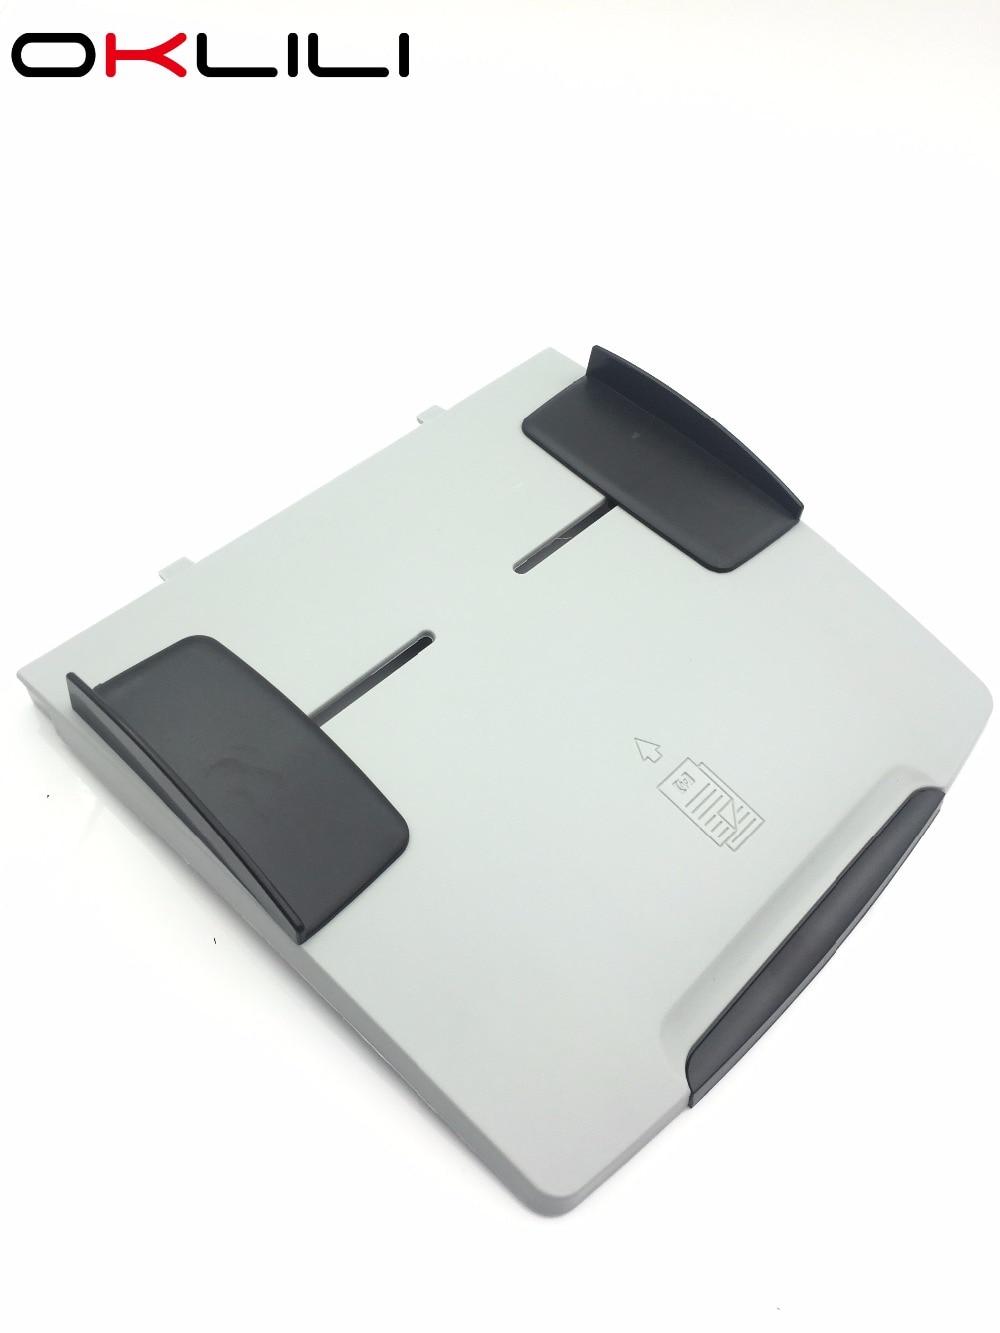 Q6500-60119 Q3948-60214 CB534-60112 ADF Paper Input Tray for HP 1522 CM1312 CM2320 3390 3392 M2727 2820 2840 3050 3052 3055 стабилизатор напряжения ресанта асн 1500 н 1 ц lux